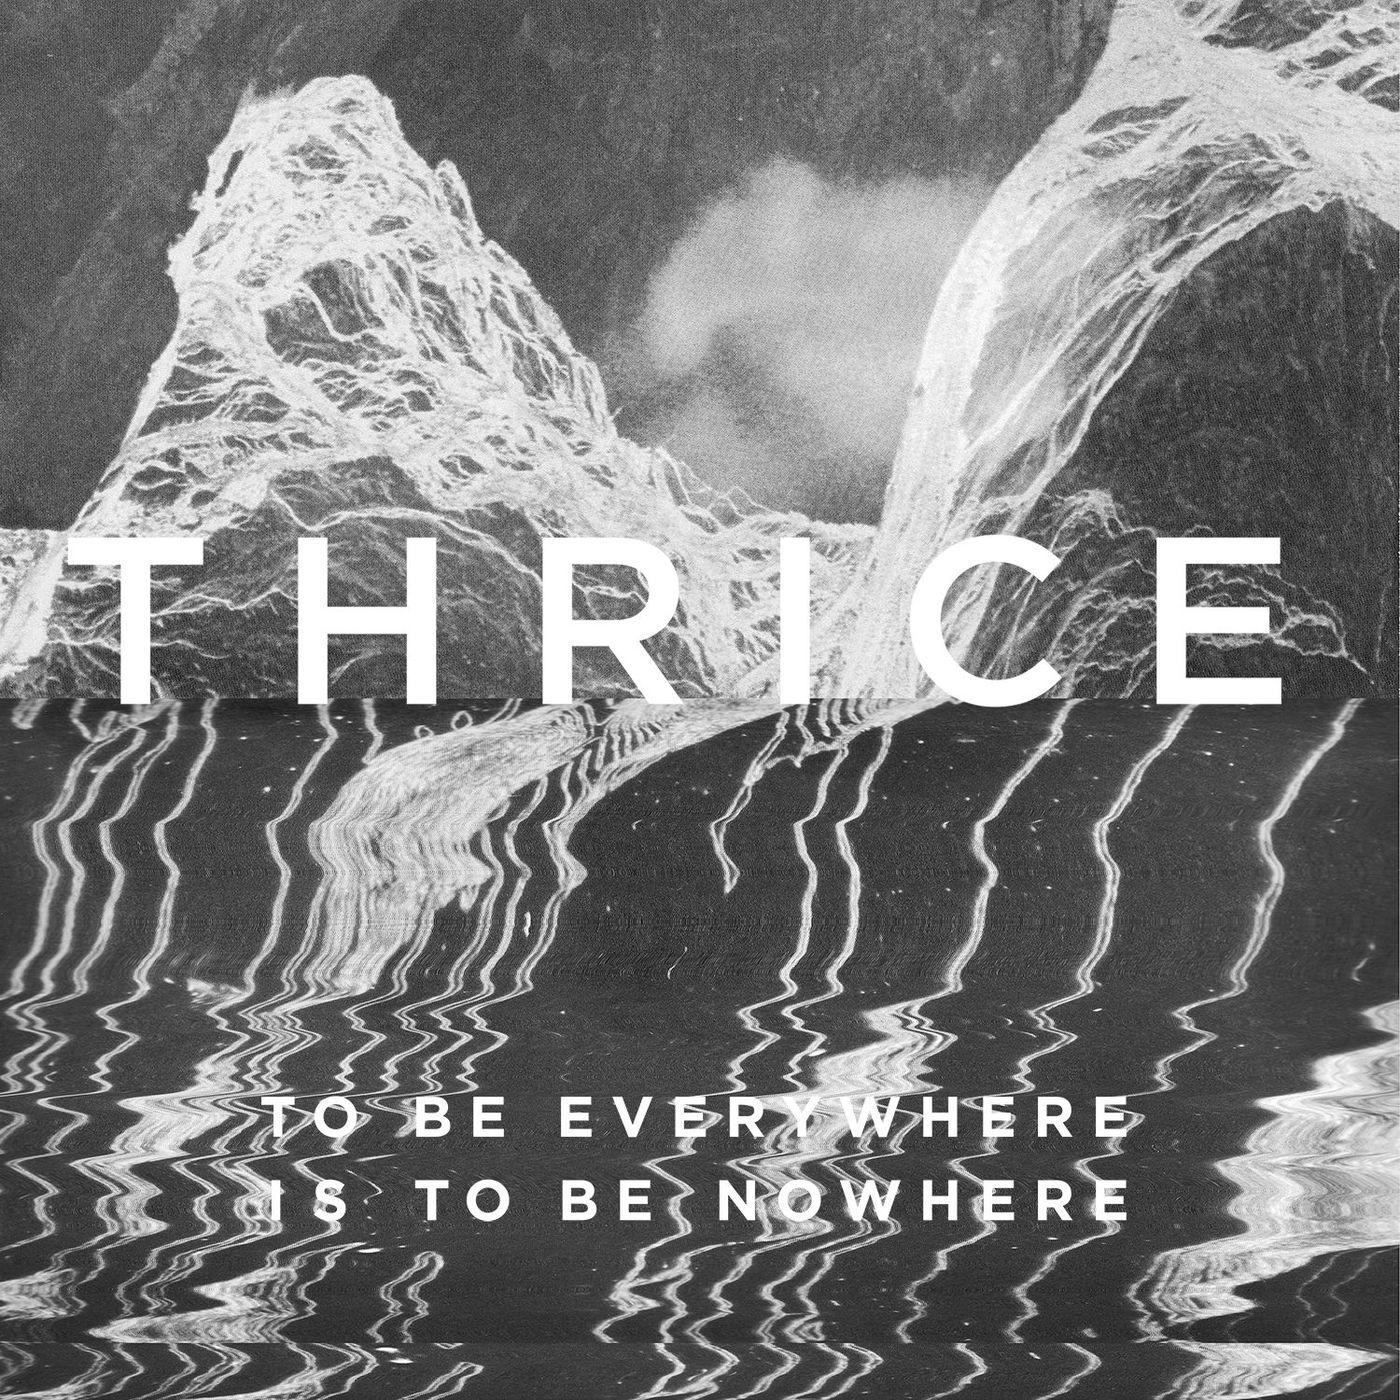 Thrice - Black Honey [Single] (2016)